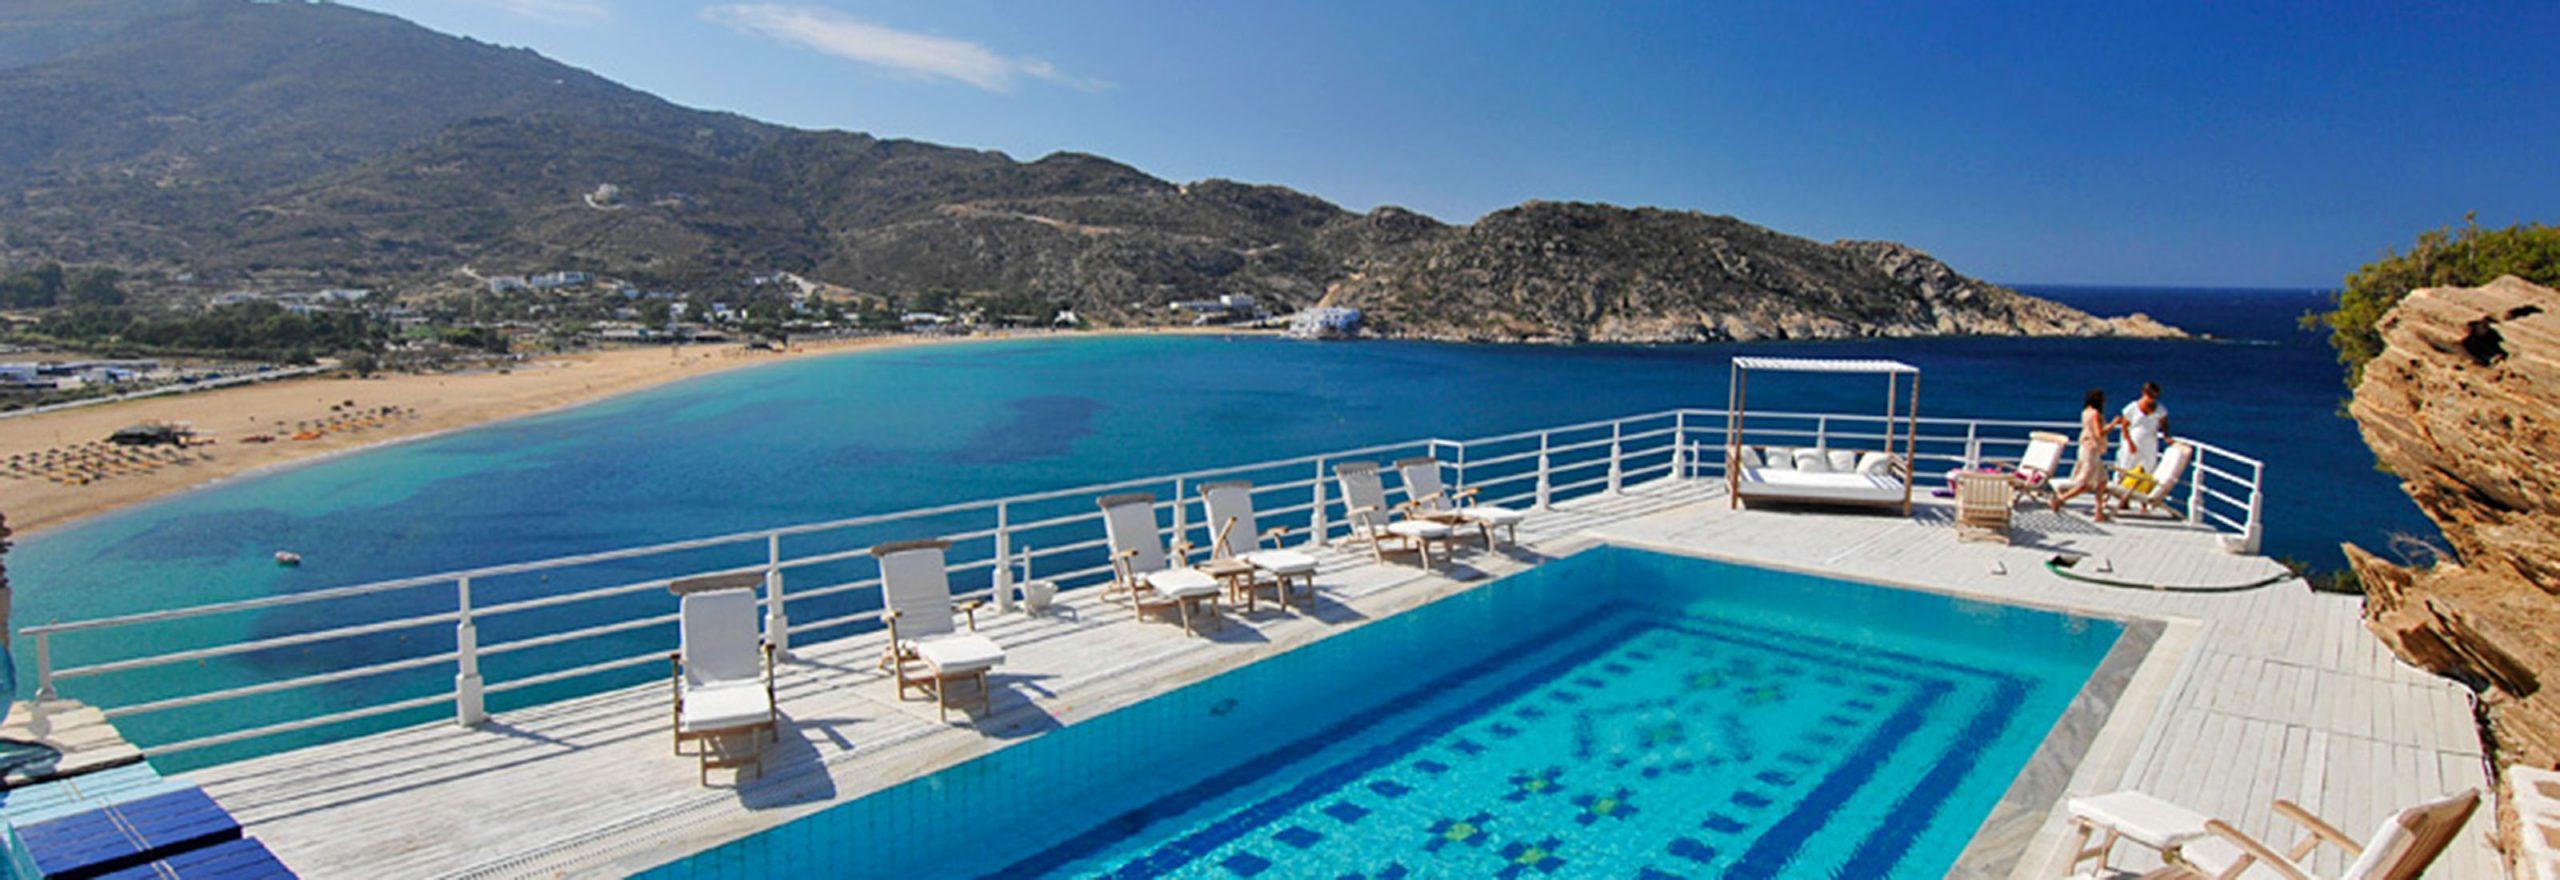 Hotel Ios Palace, Mylopotas, Ios